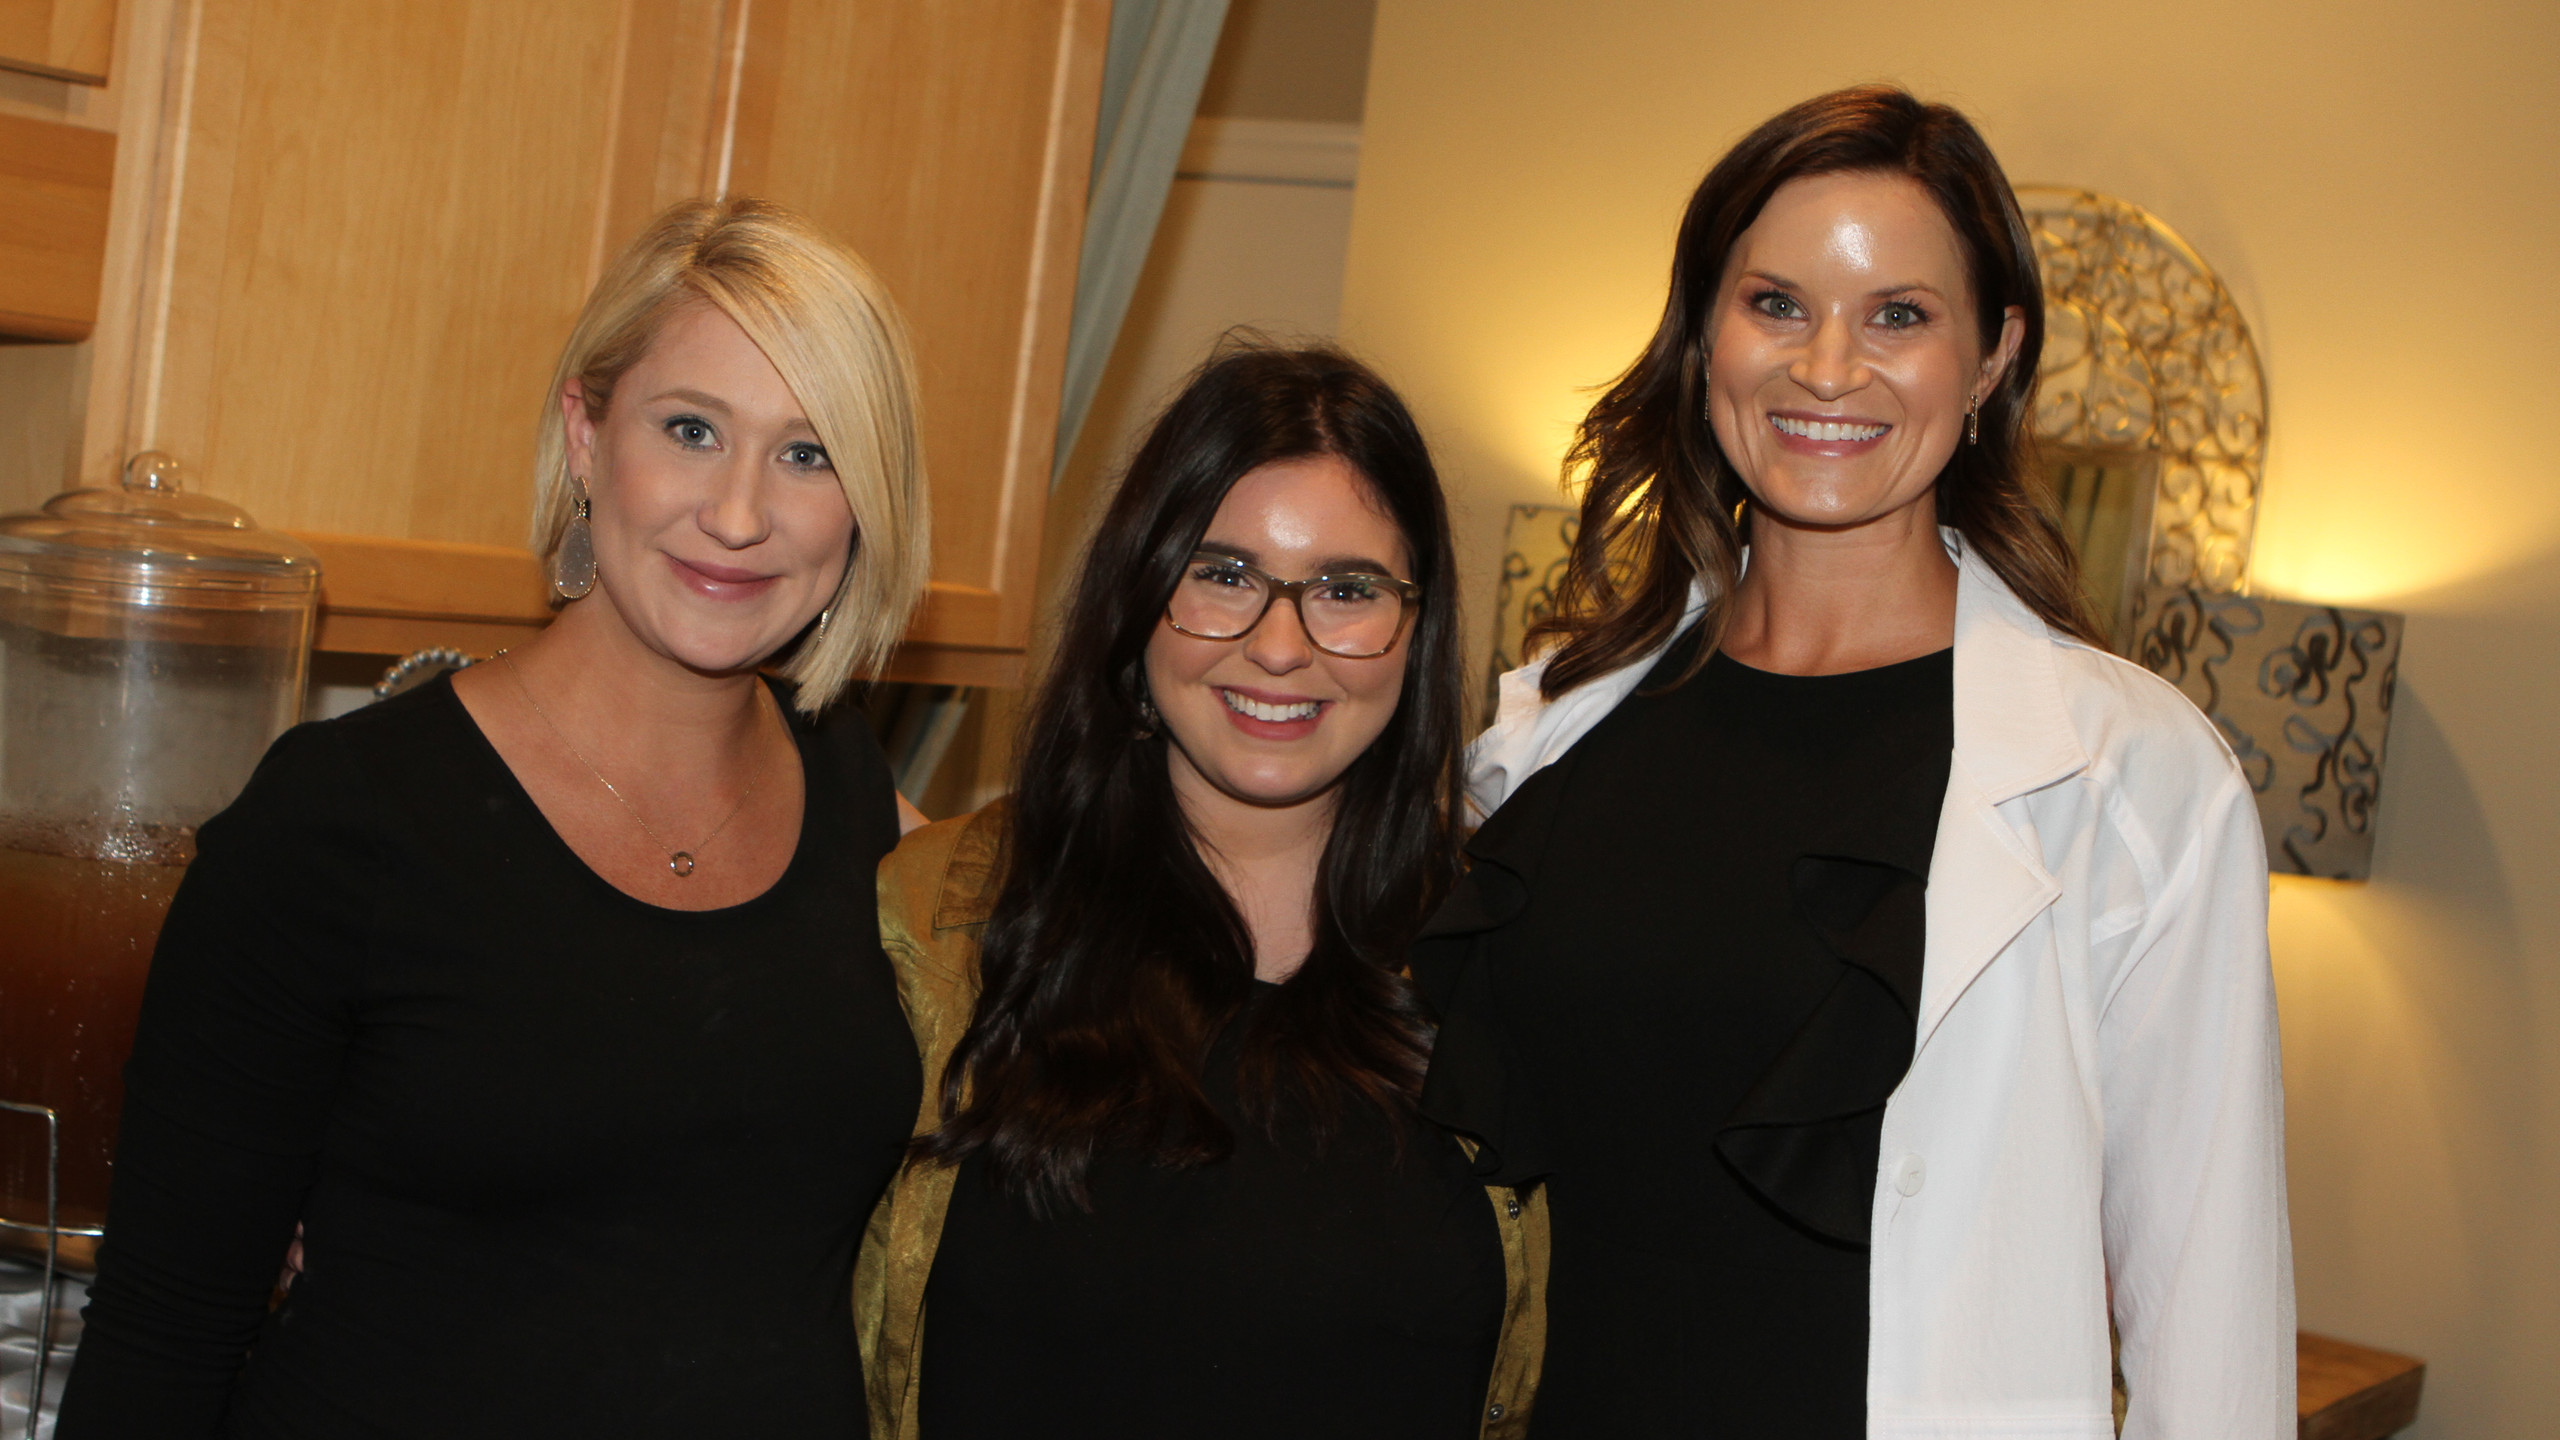 Kelsey Harvey, Tori Proctor, Amanda Hurt